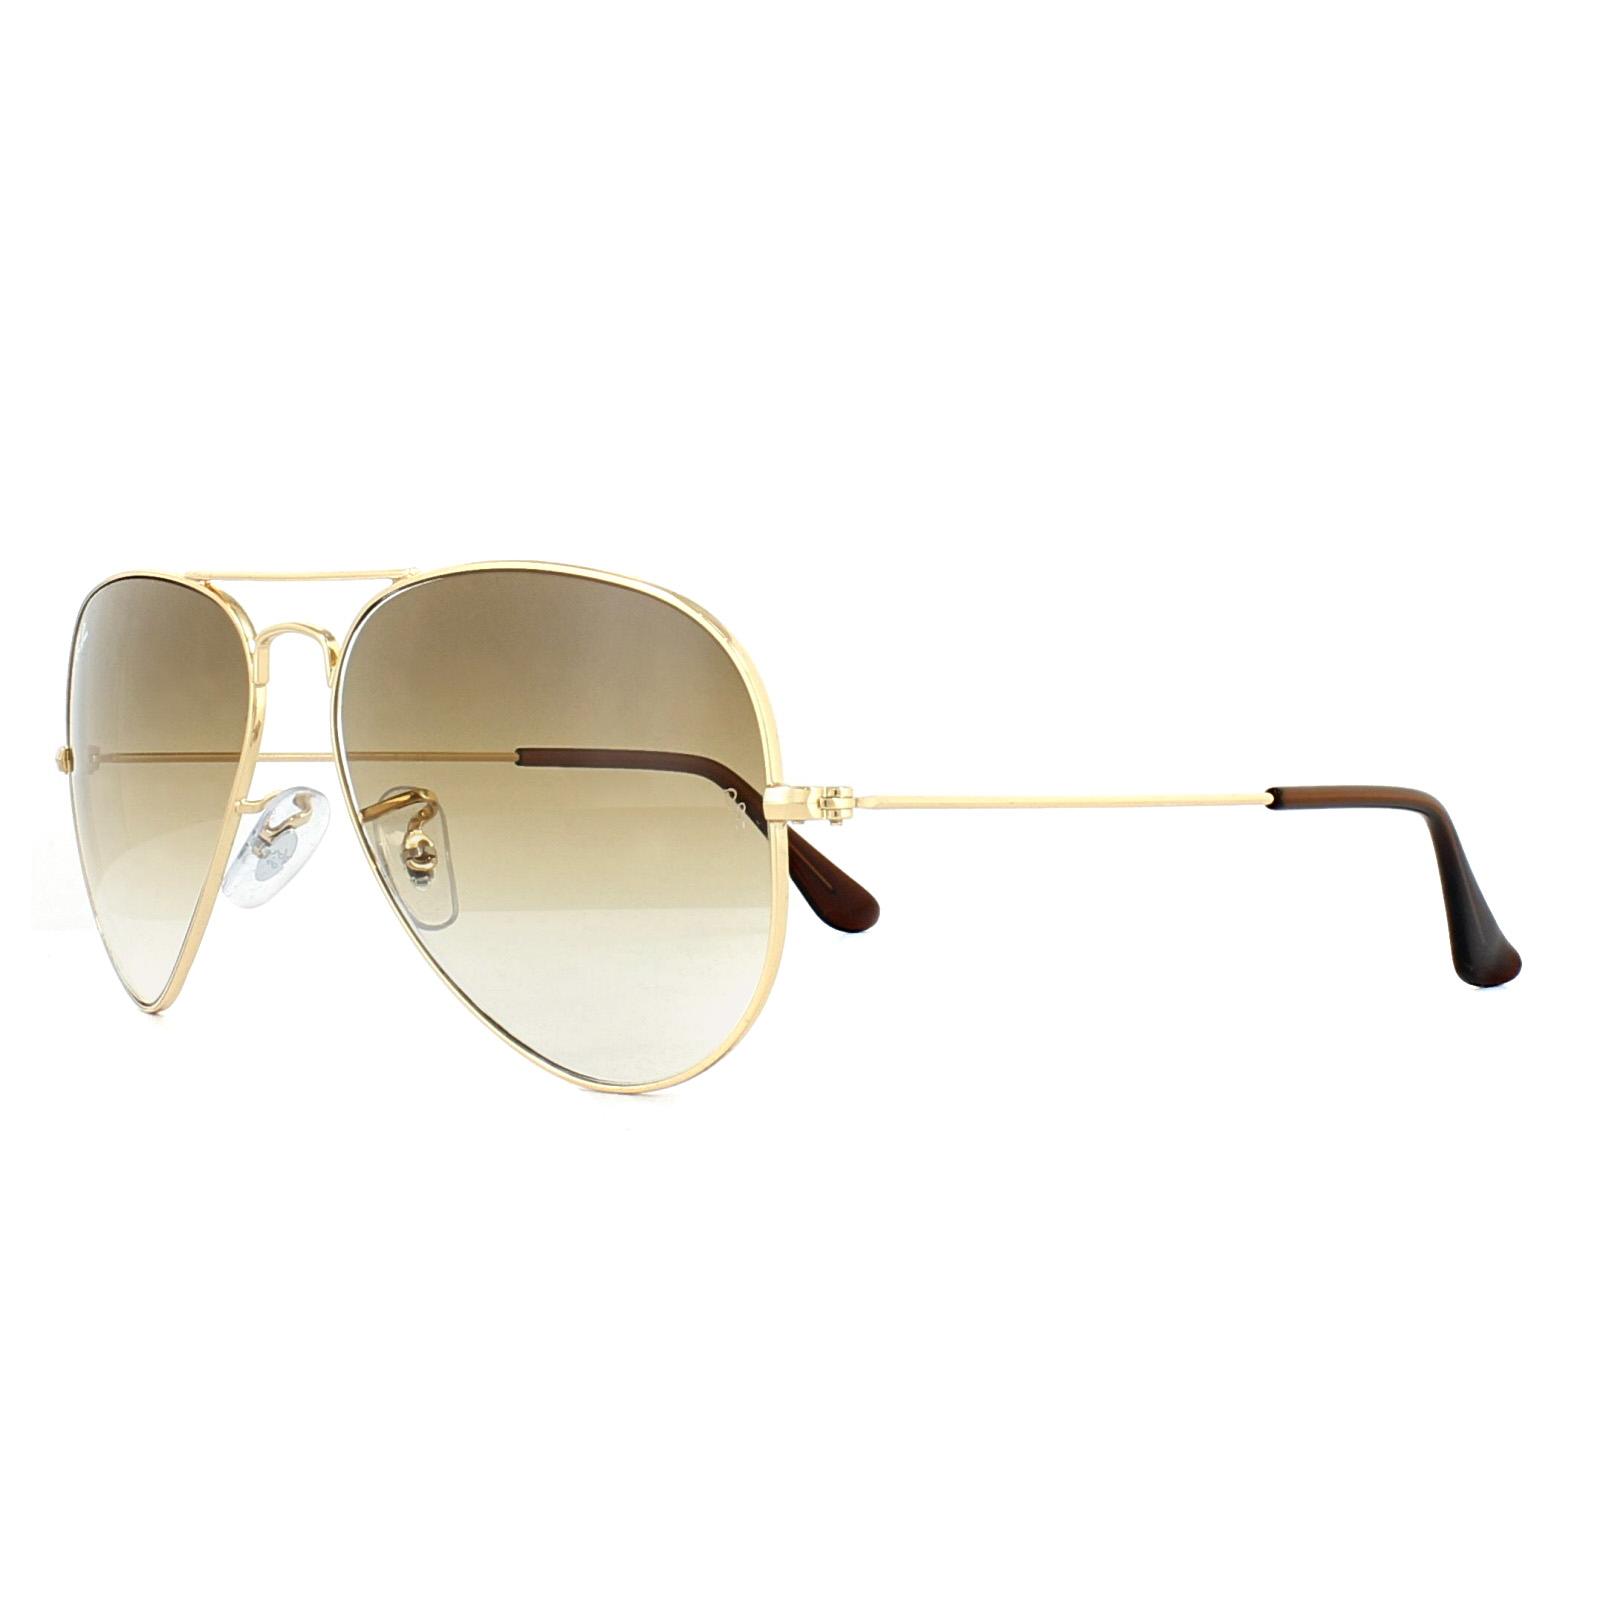 47641742e328f Sentinel Ray-Ban Sunglasses Aviator 3025 001 51 Gold Brown Gradient Medium  58mm